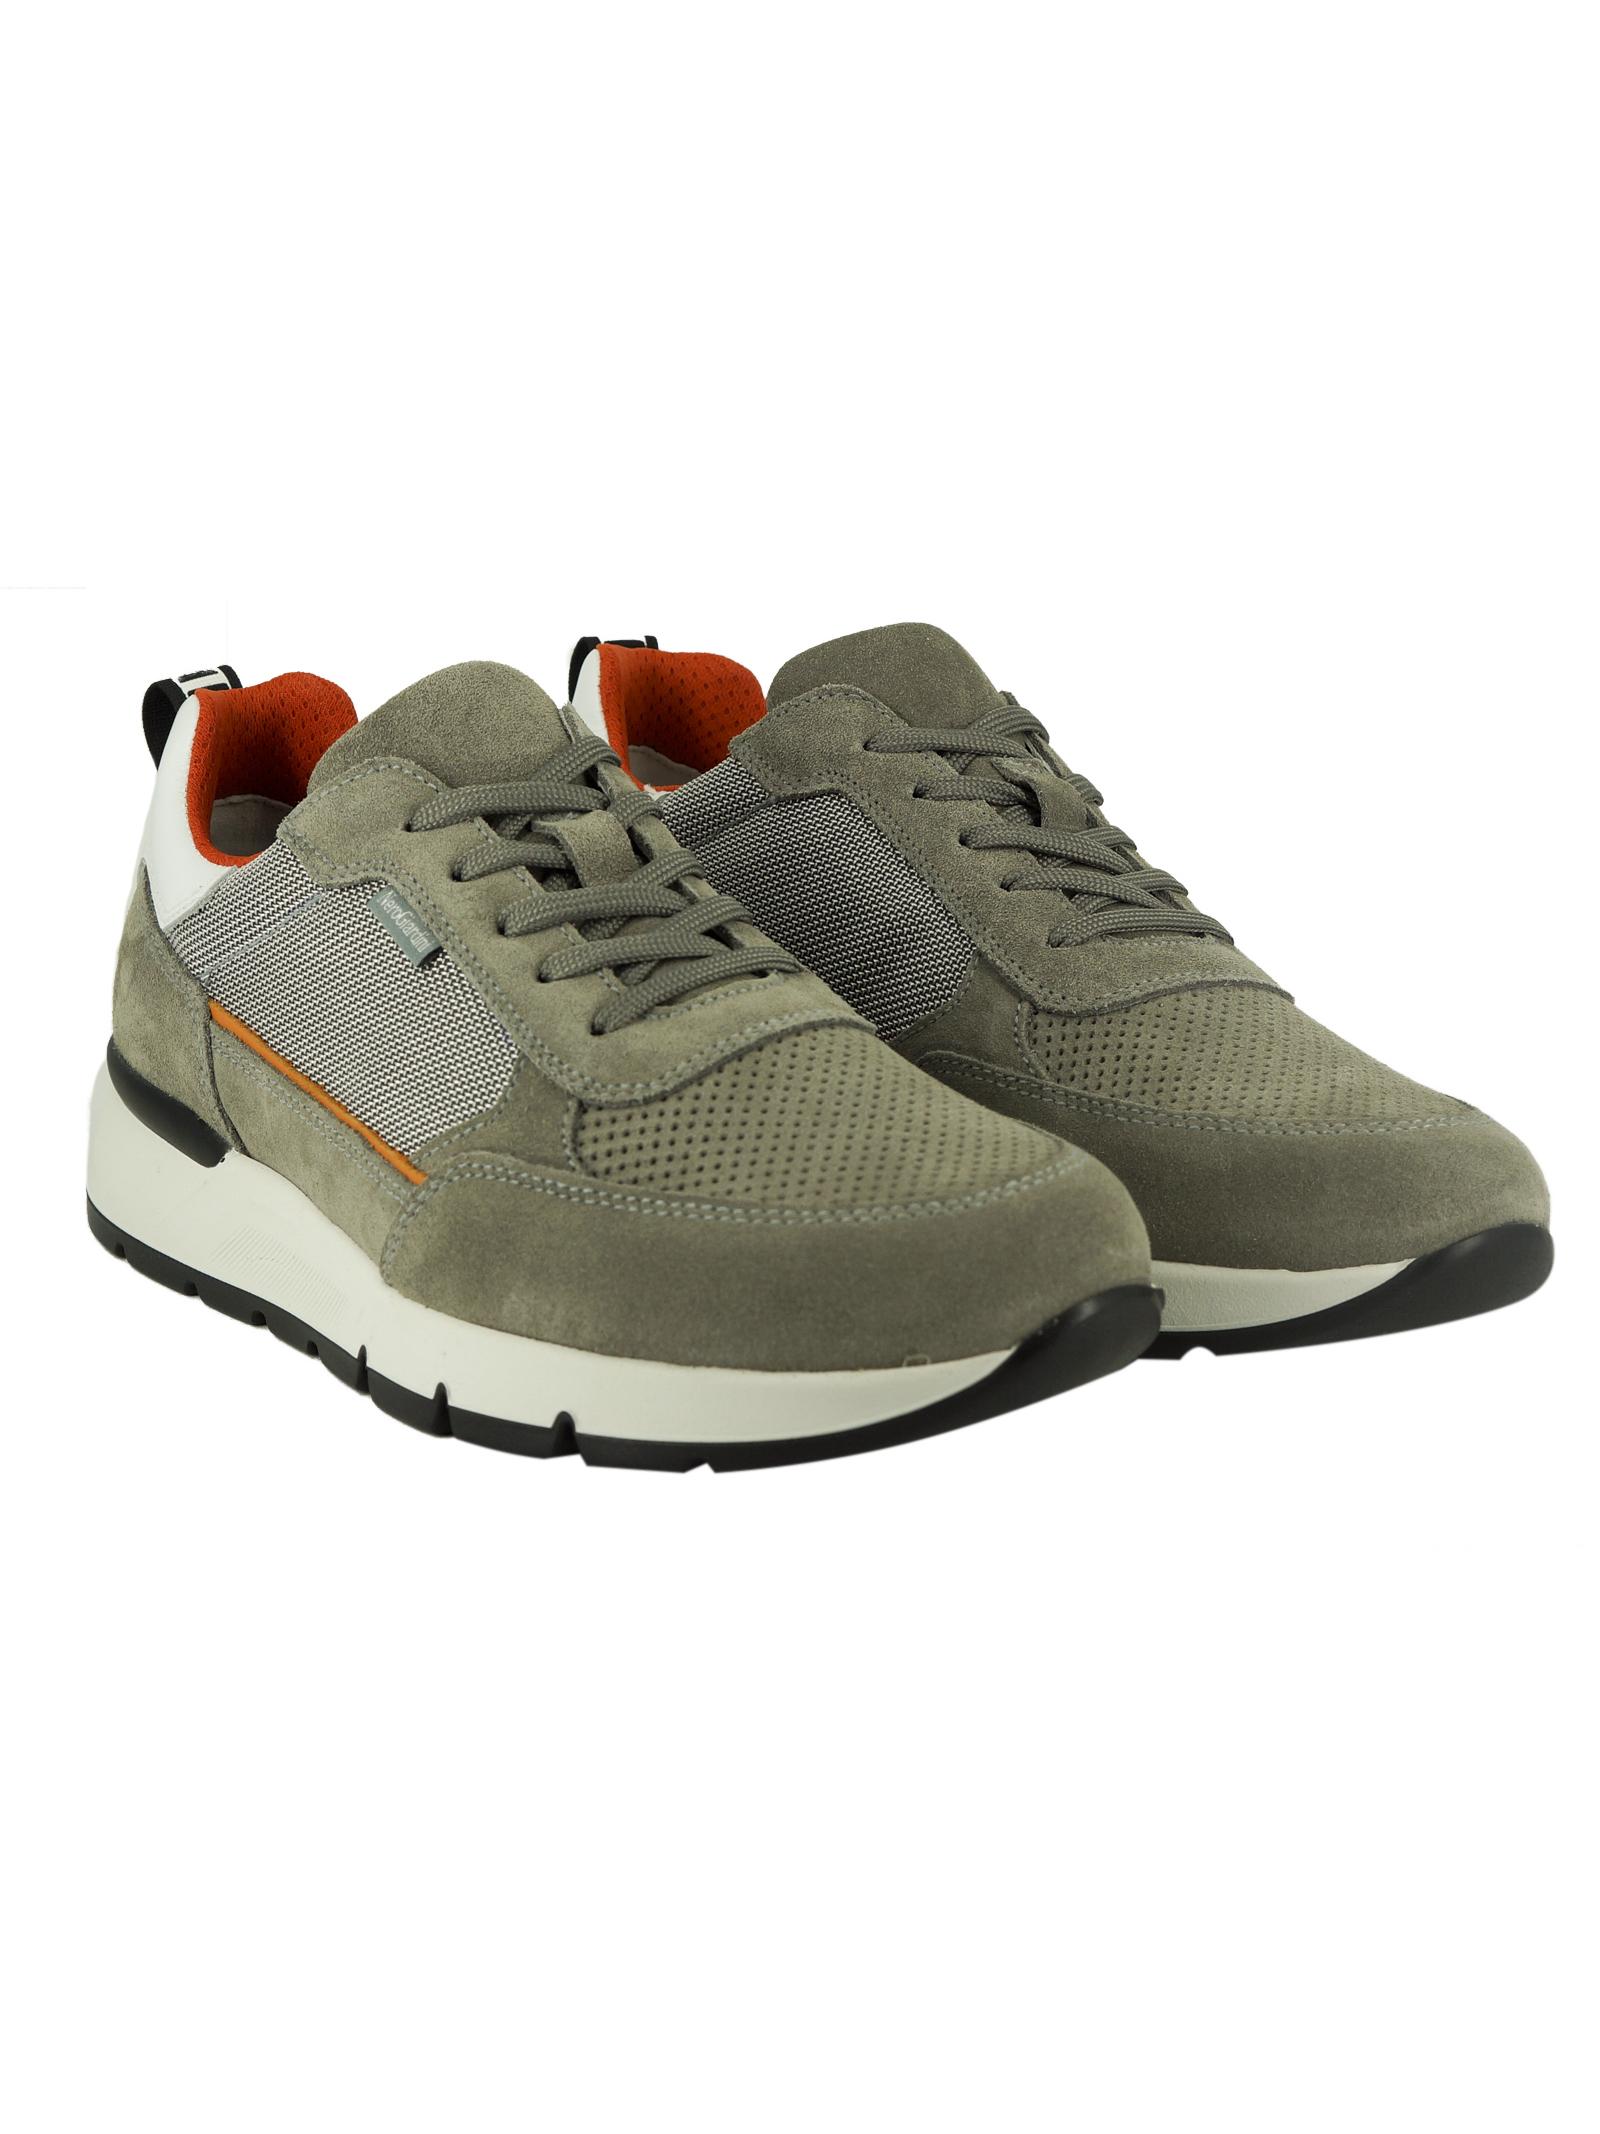 SNEAKERS Nero Giardini | Sneakers | E101990UGRIGIO106